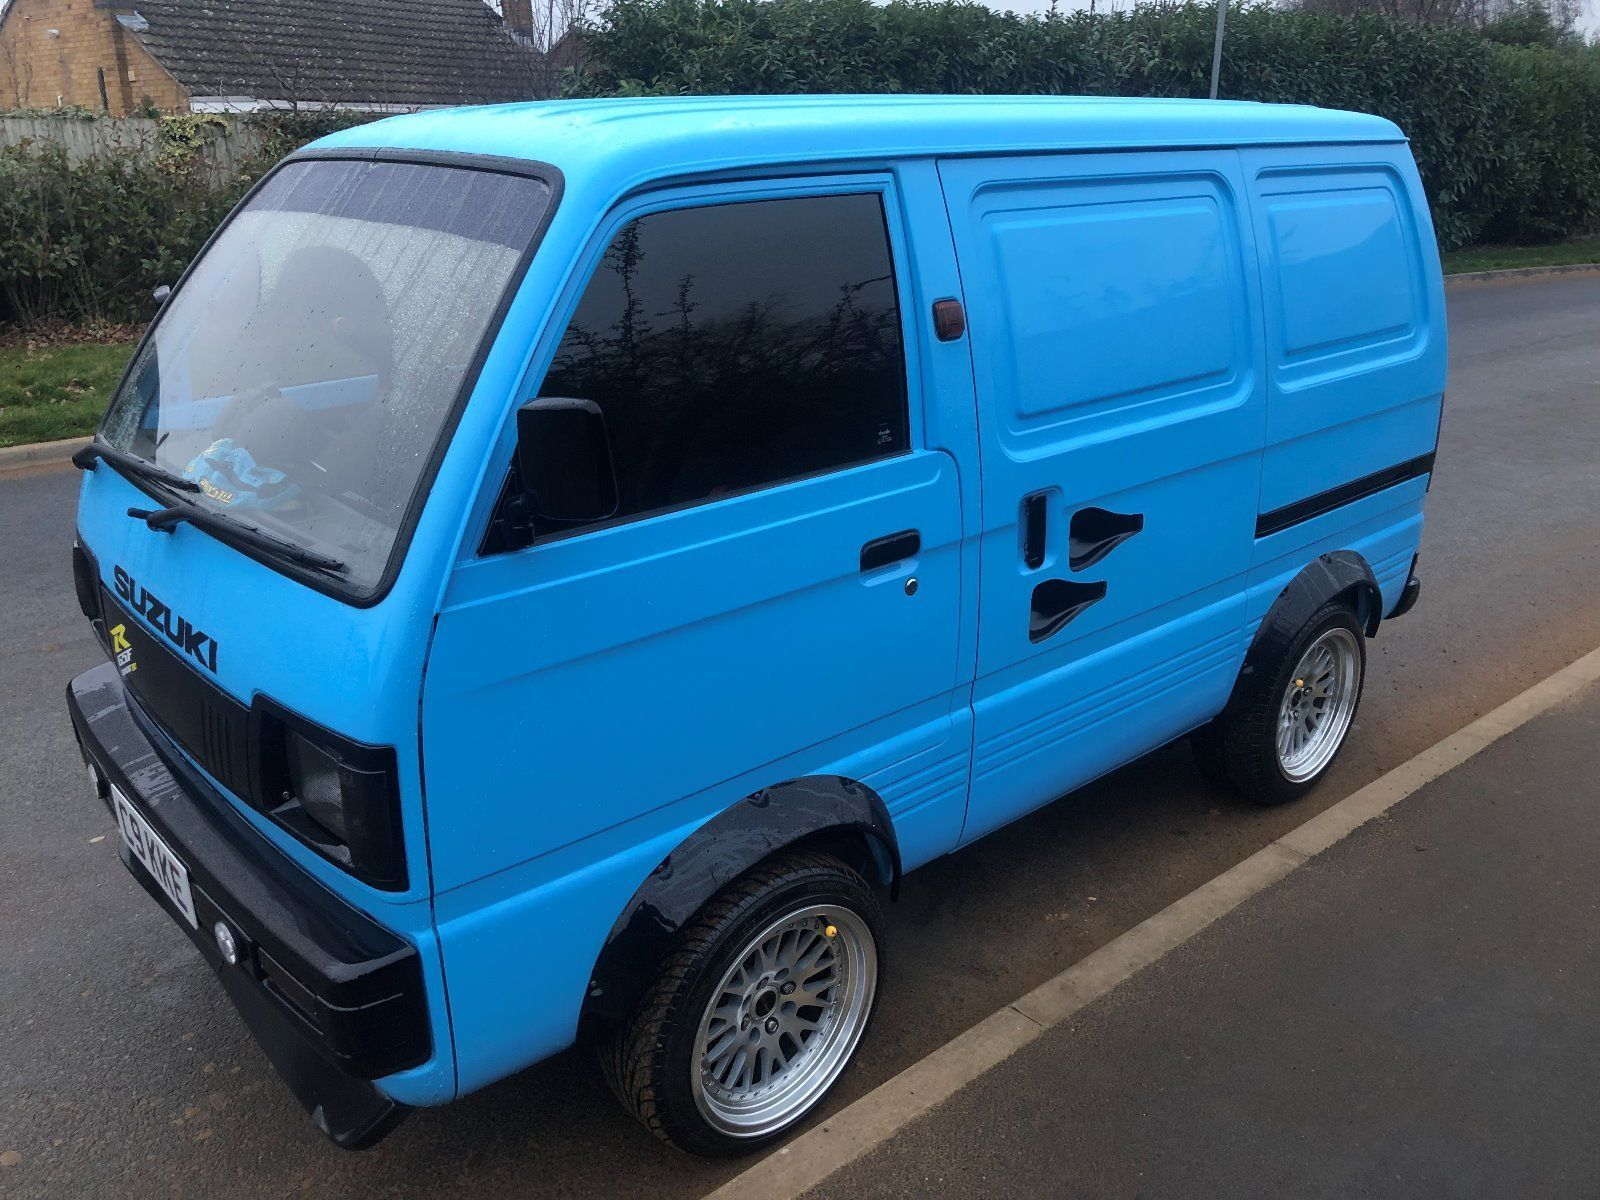 For Sale 1991 Suzuki Van With A Gsx1250 Motorcycle Engine Engine Swap Depot In 2020 Suzuki Carry Van Suzuki